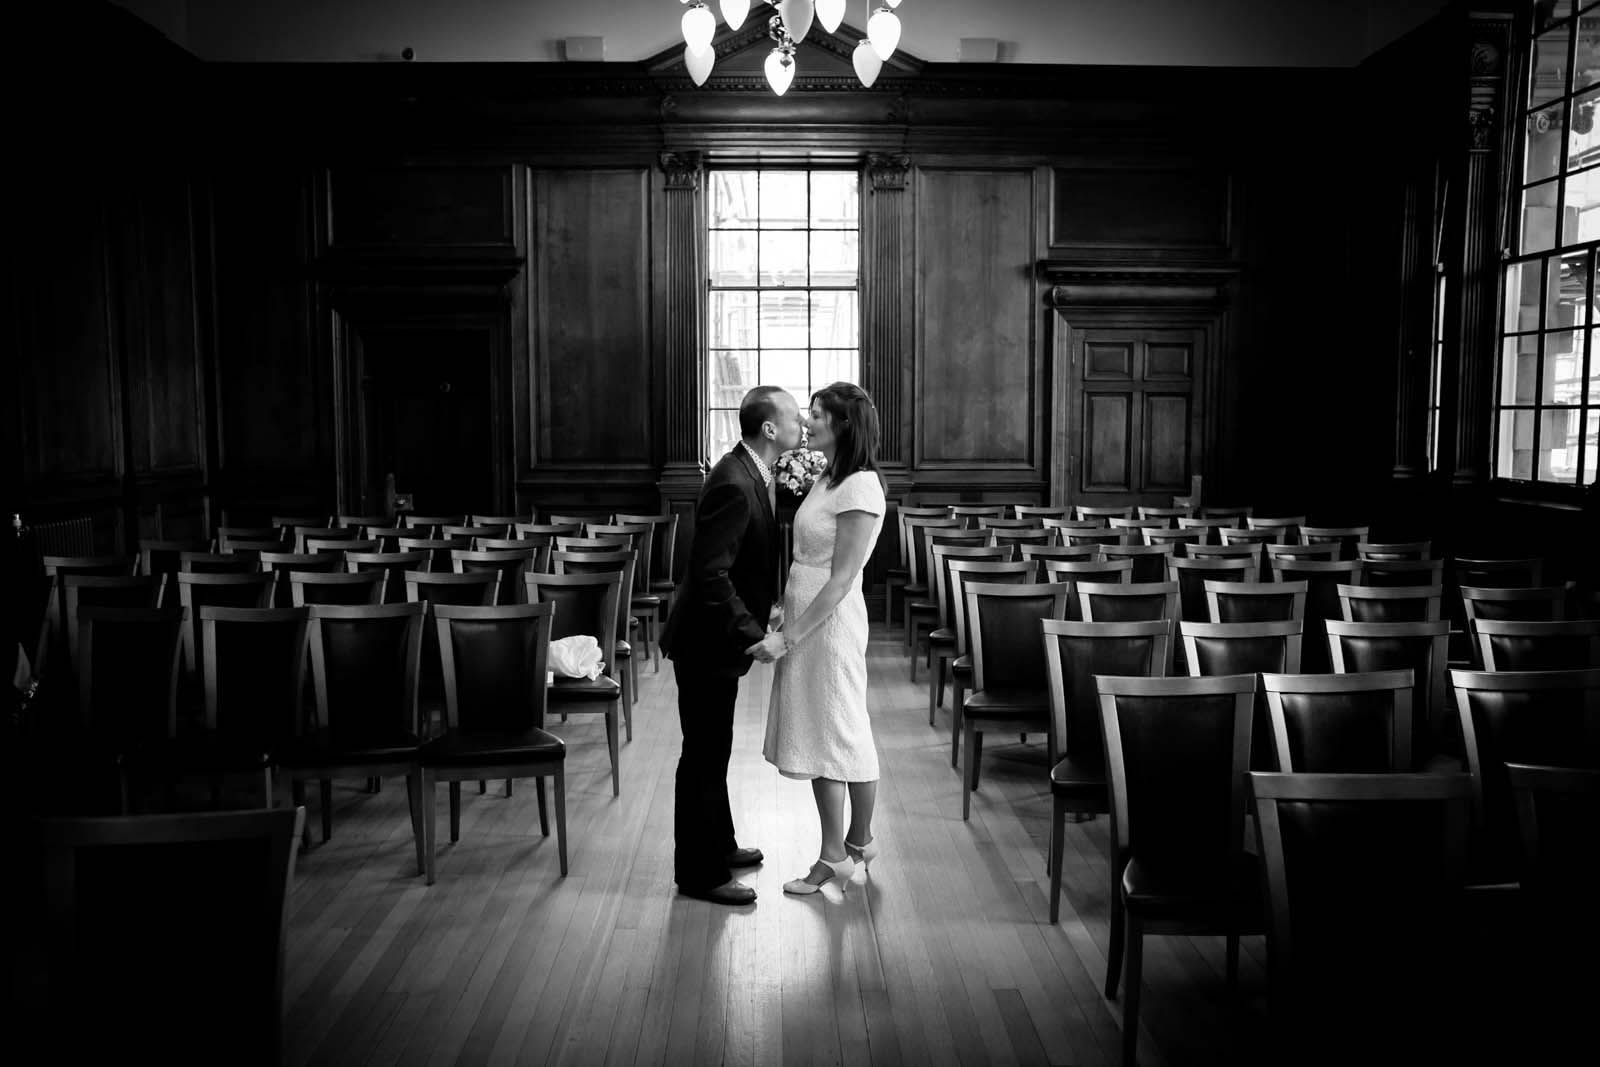 Nadine and Richard's wedding day-19.jpg